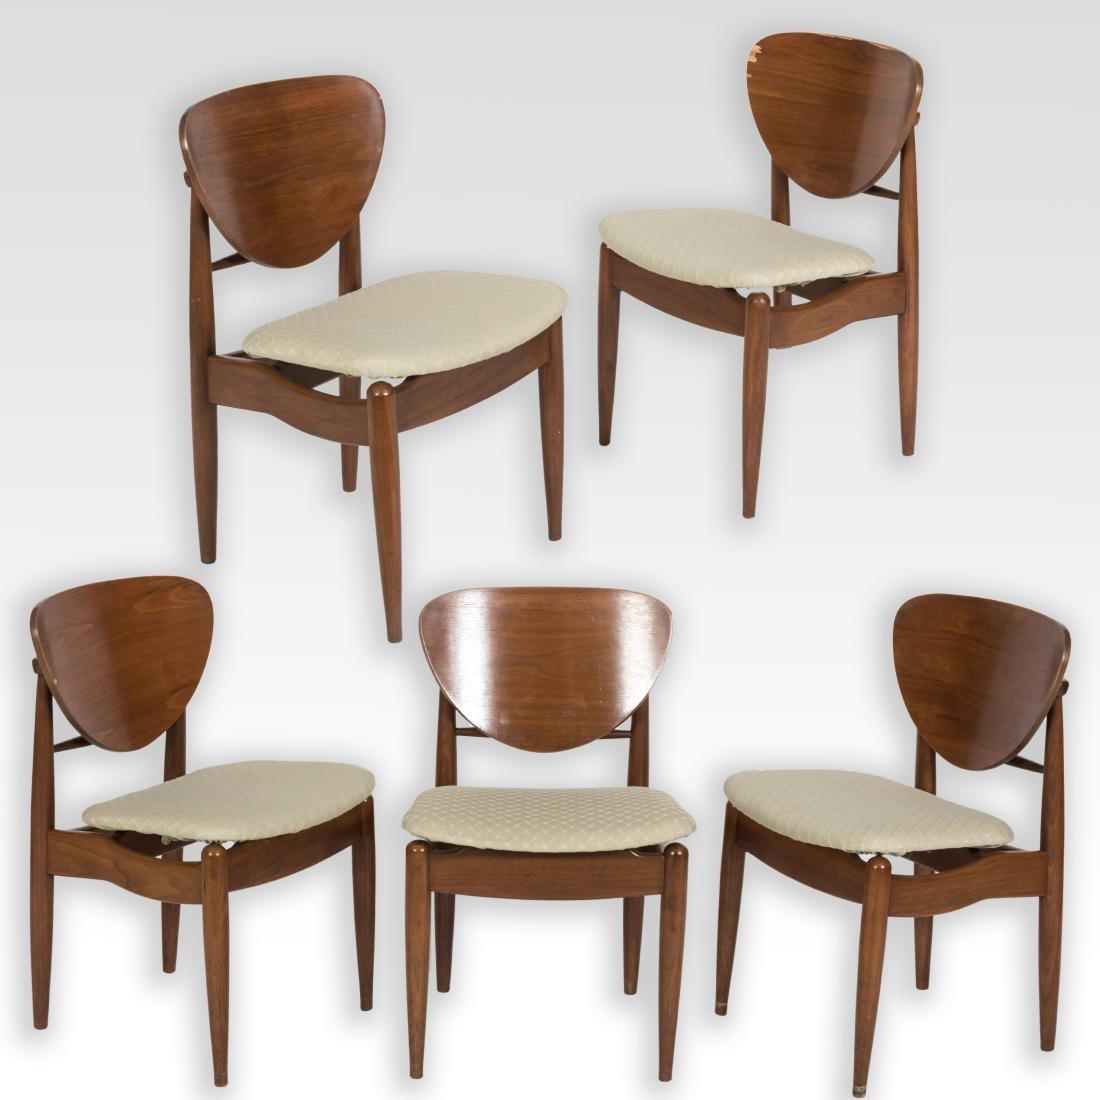 Set of Five John Stuart Walnut Dining Room Chairs : Lot 0023